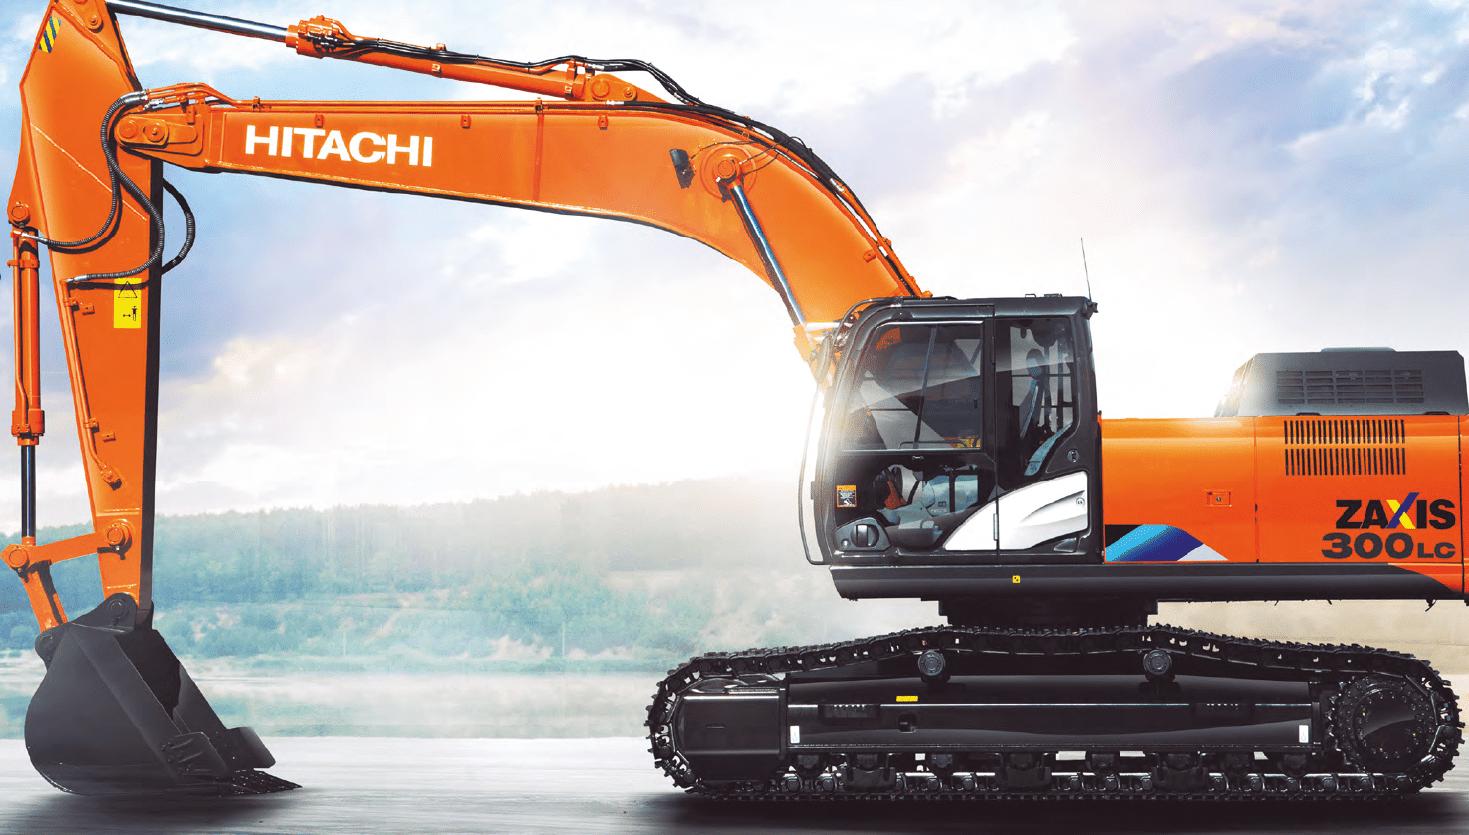 экскаватор среднего класса Hitachi ZX 300 5A